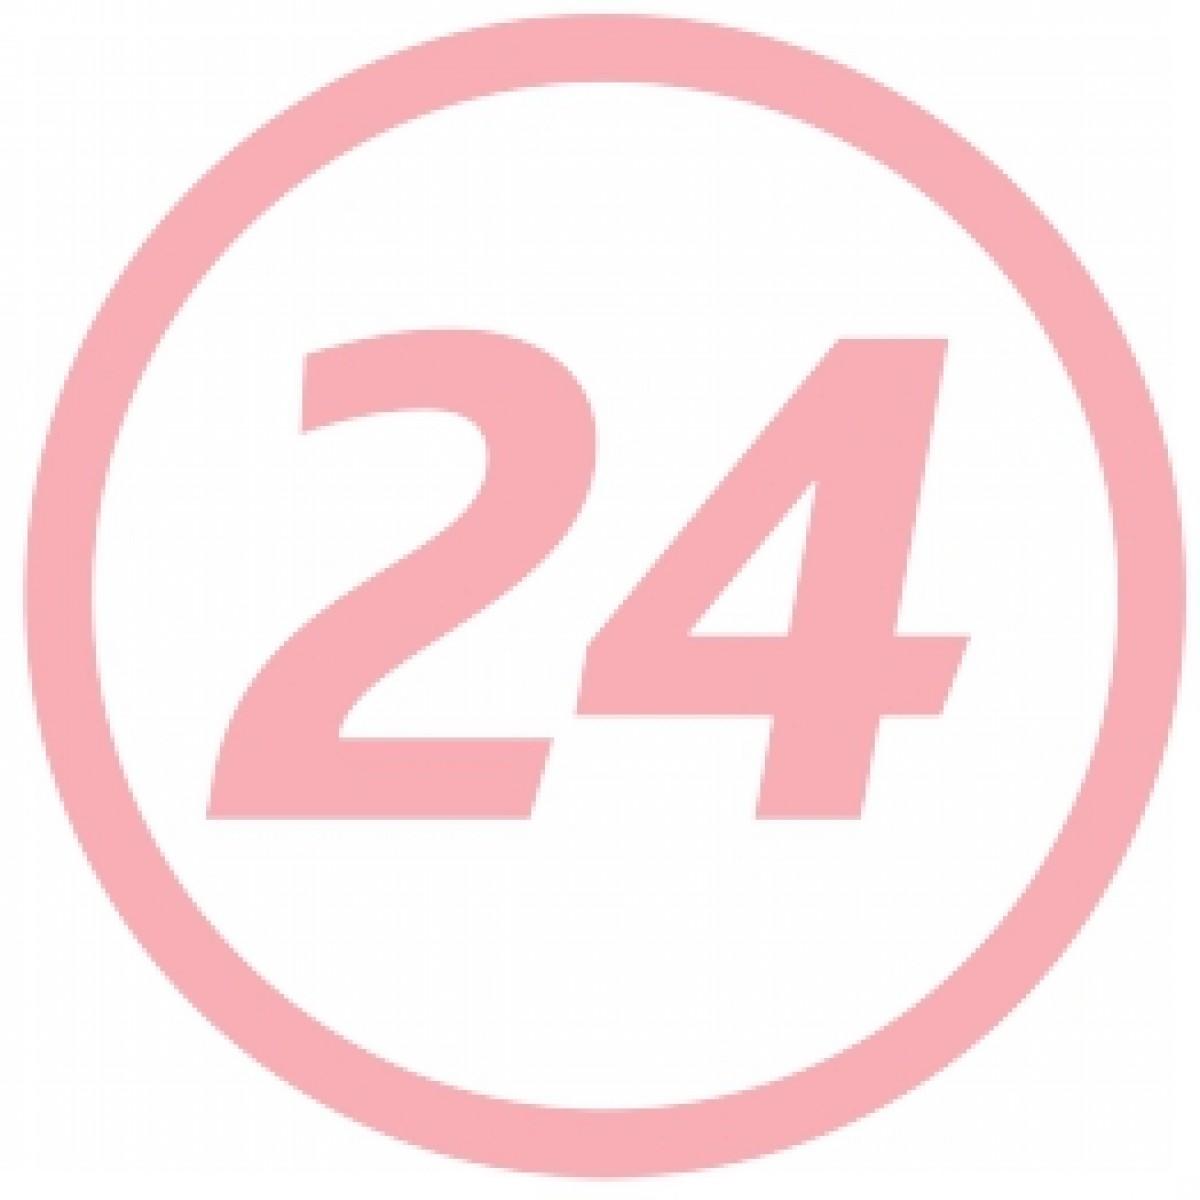 Klorane Bebe Eryteal Unguent, Unguent, 75g